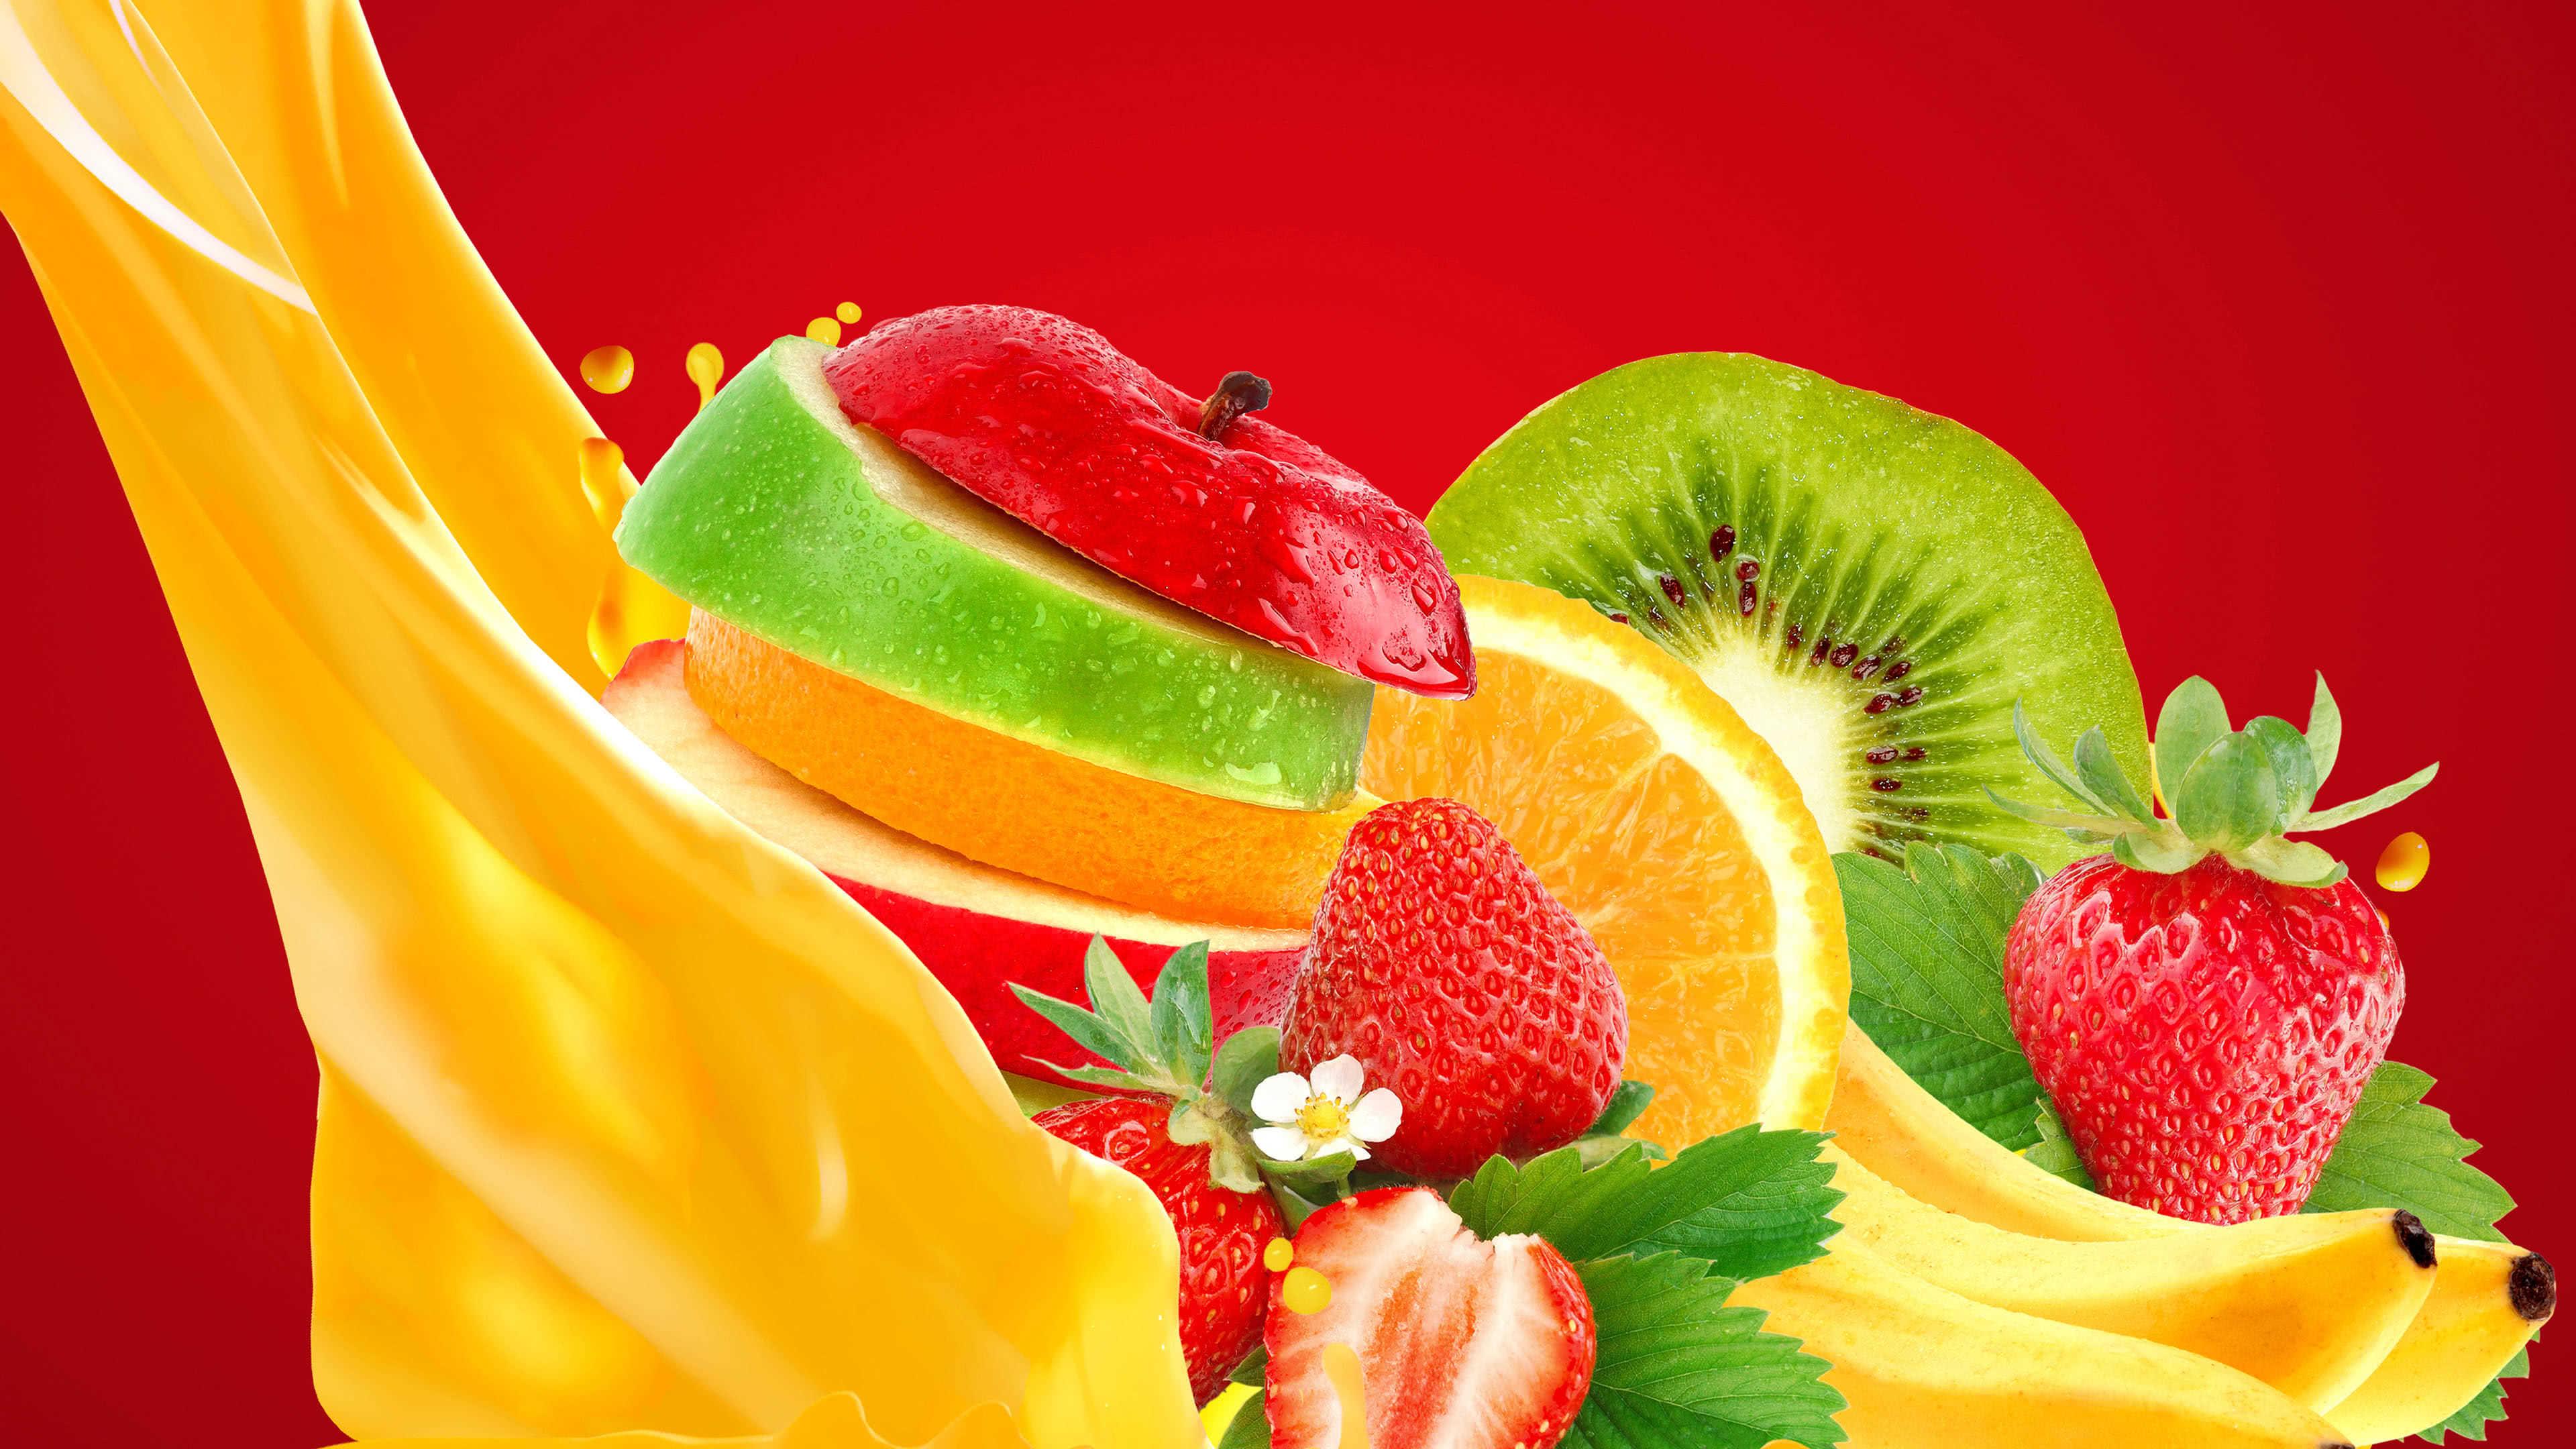 mixed fruits strawberry banana apple kiwi orange uhd 4k wallpaper